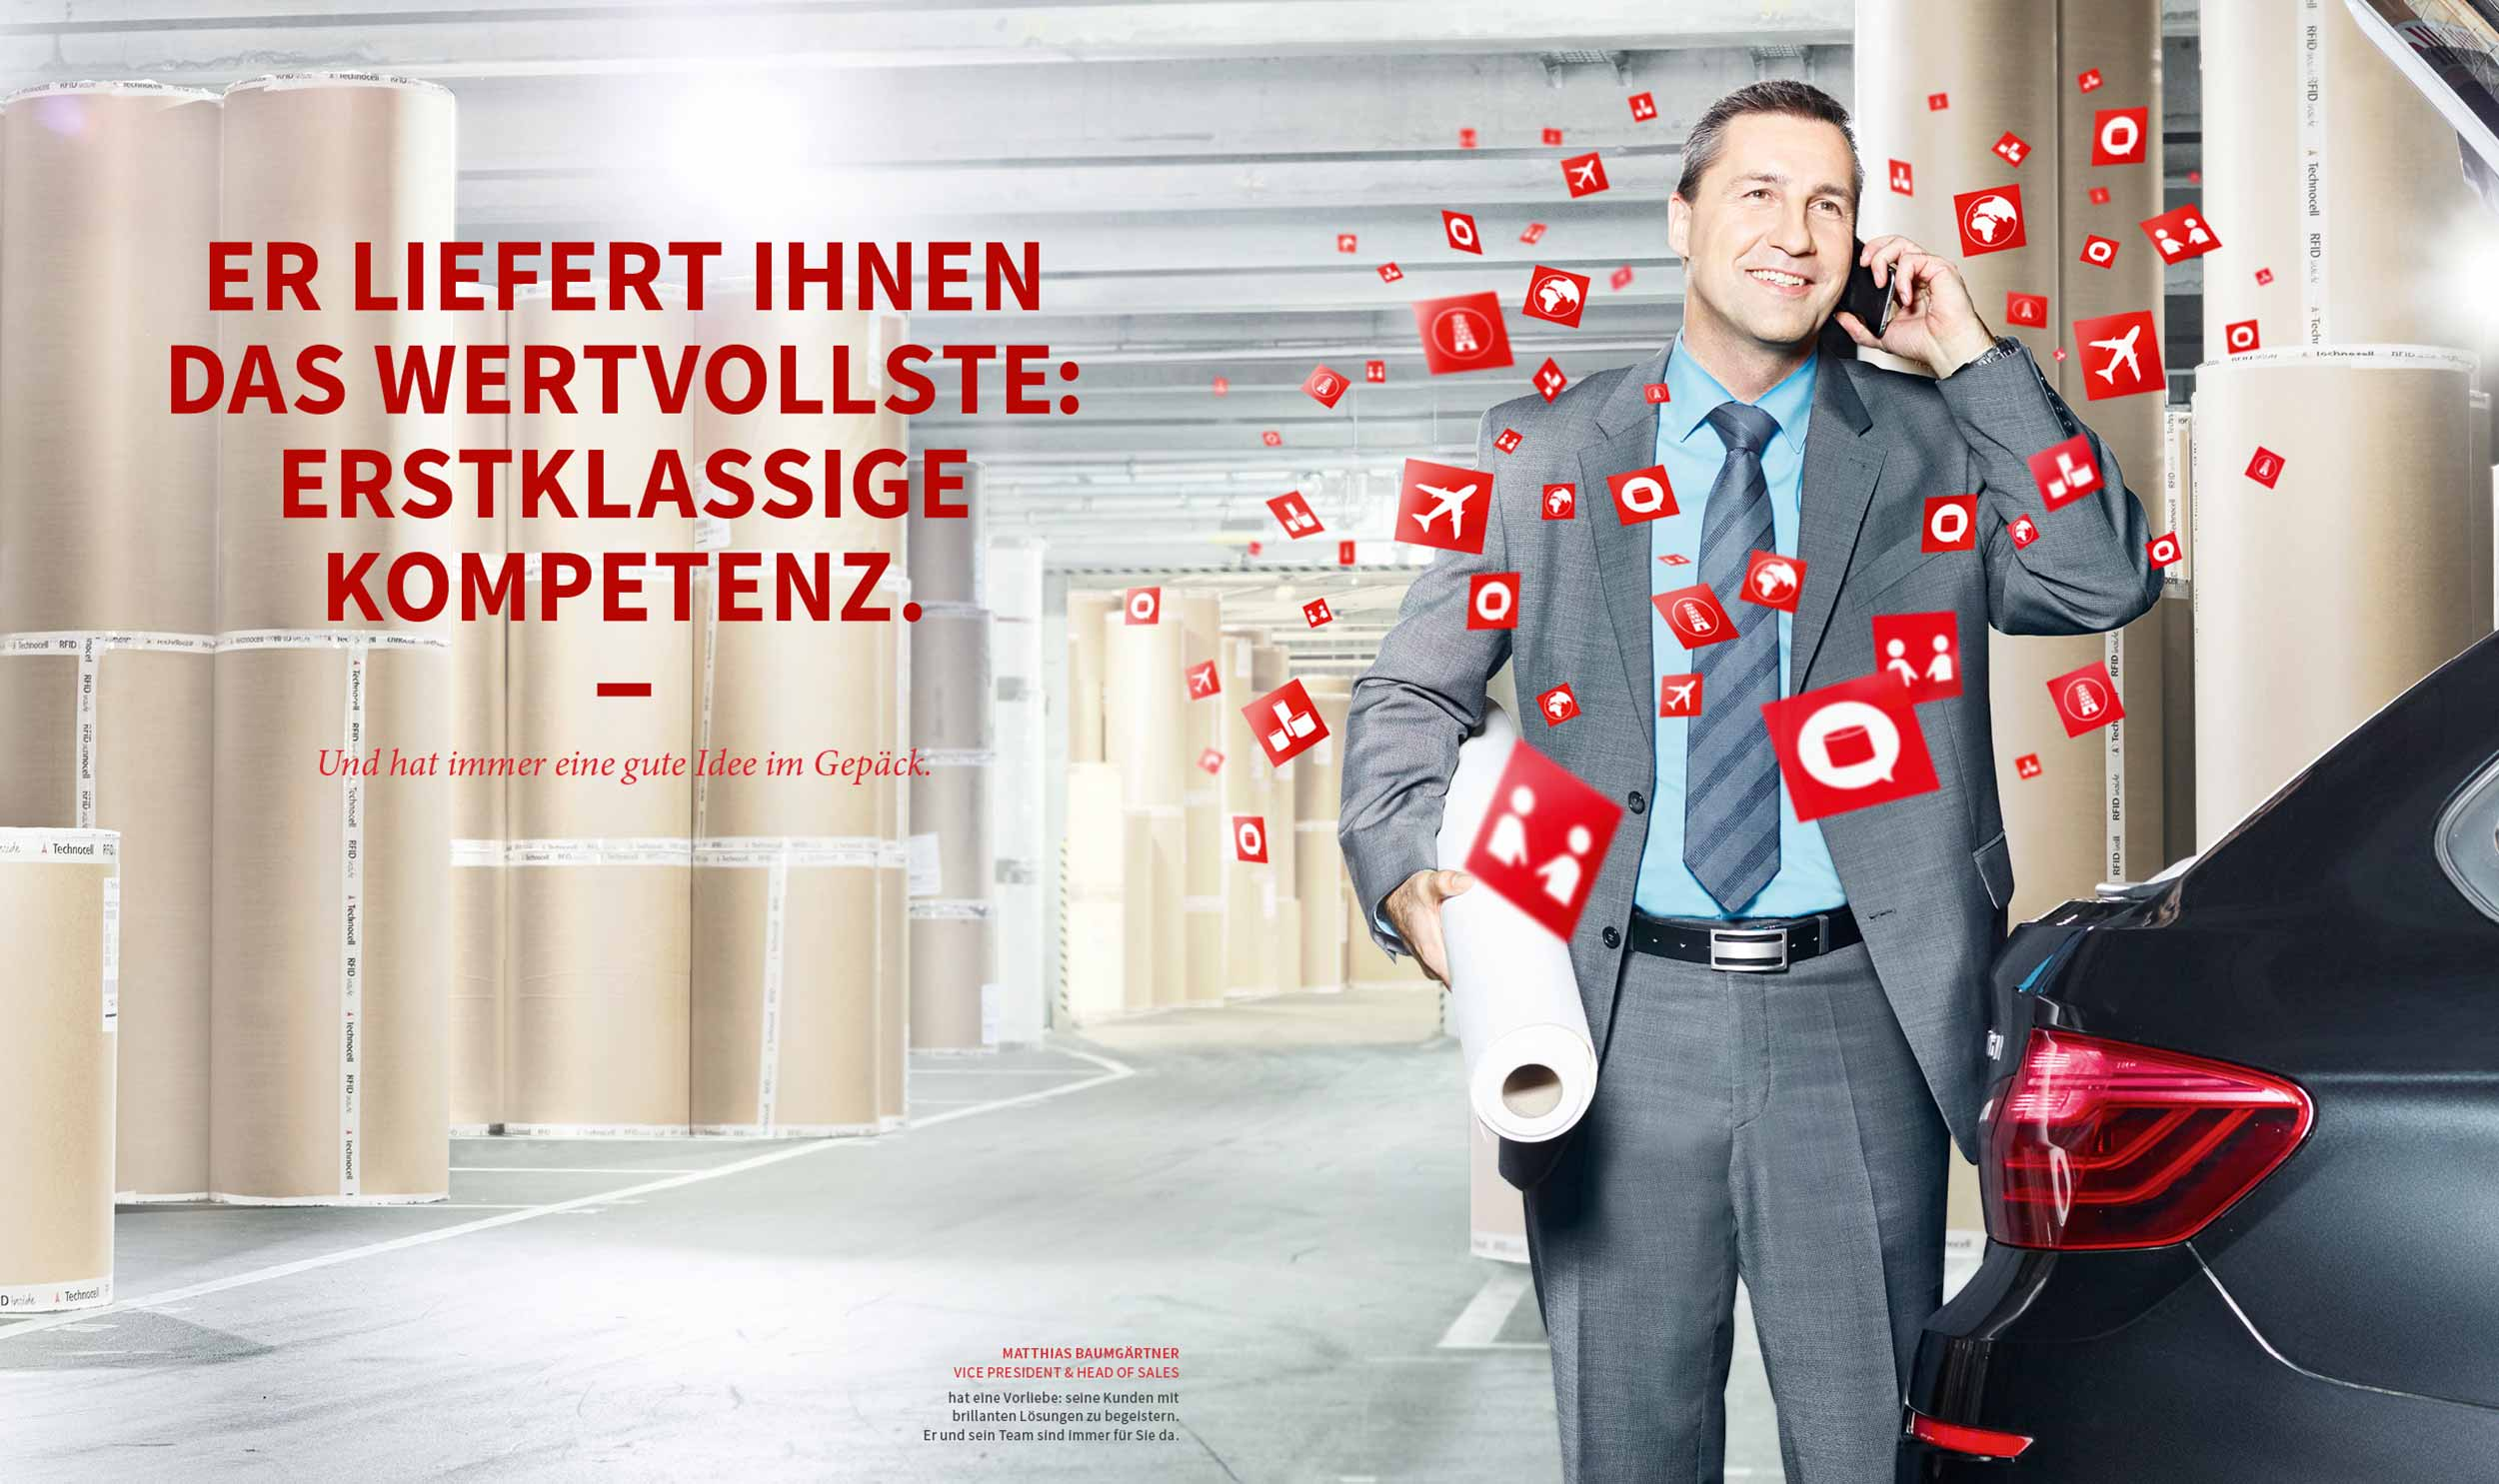 cyclos technocell vlies image kampagne B2B Marketing Werbeagentur